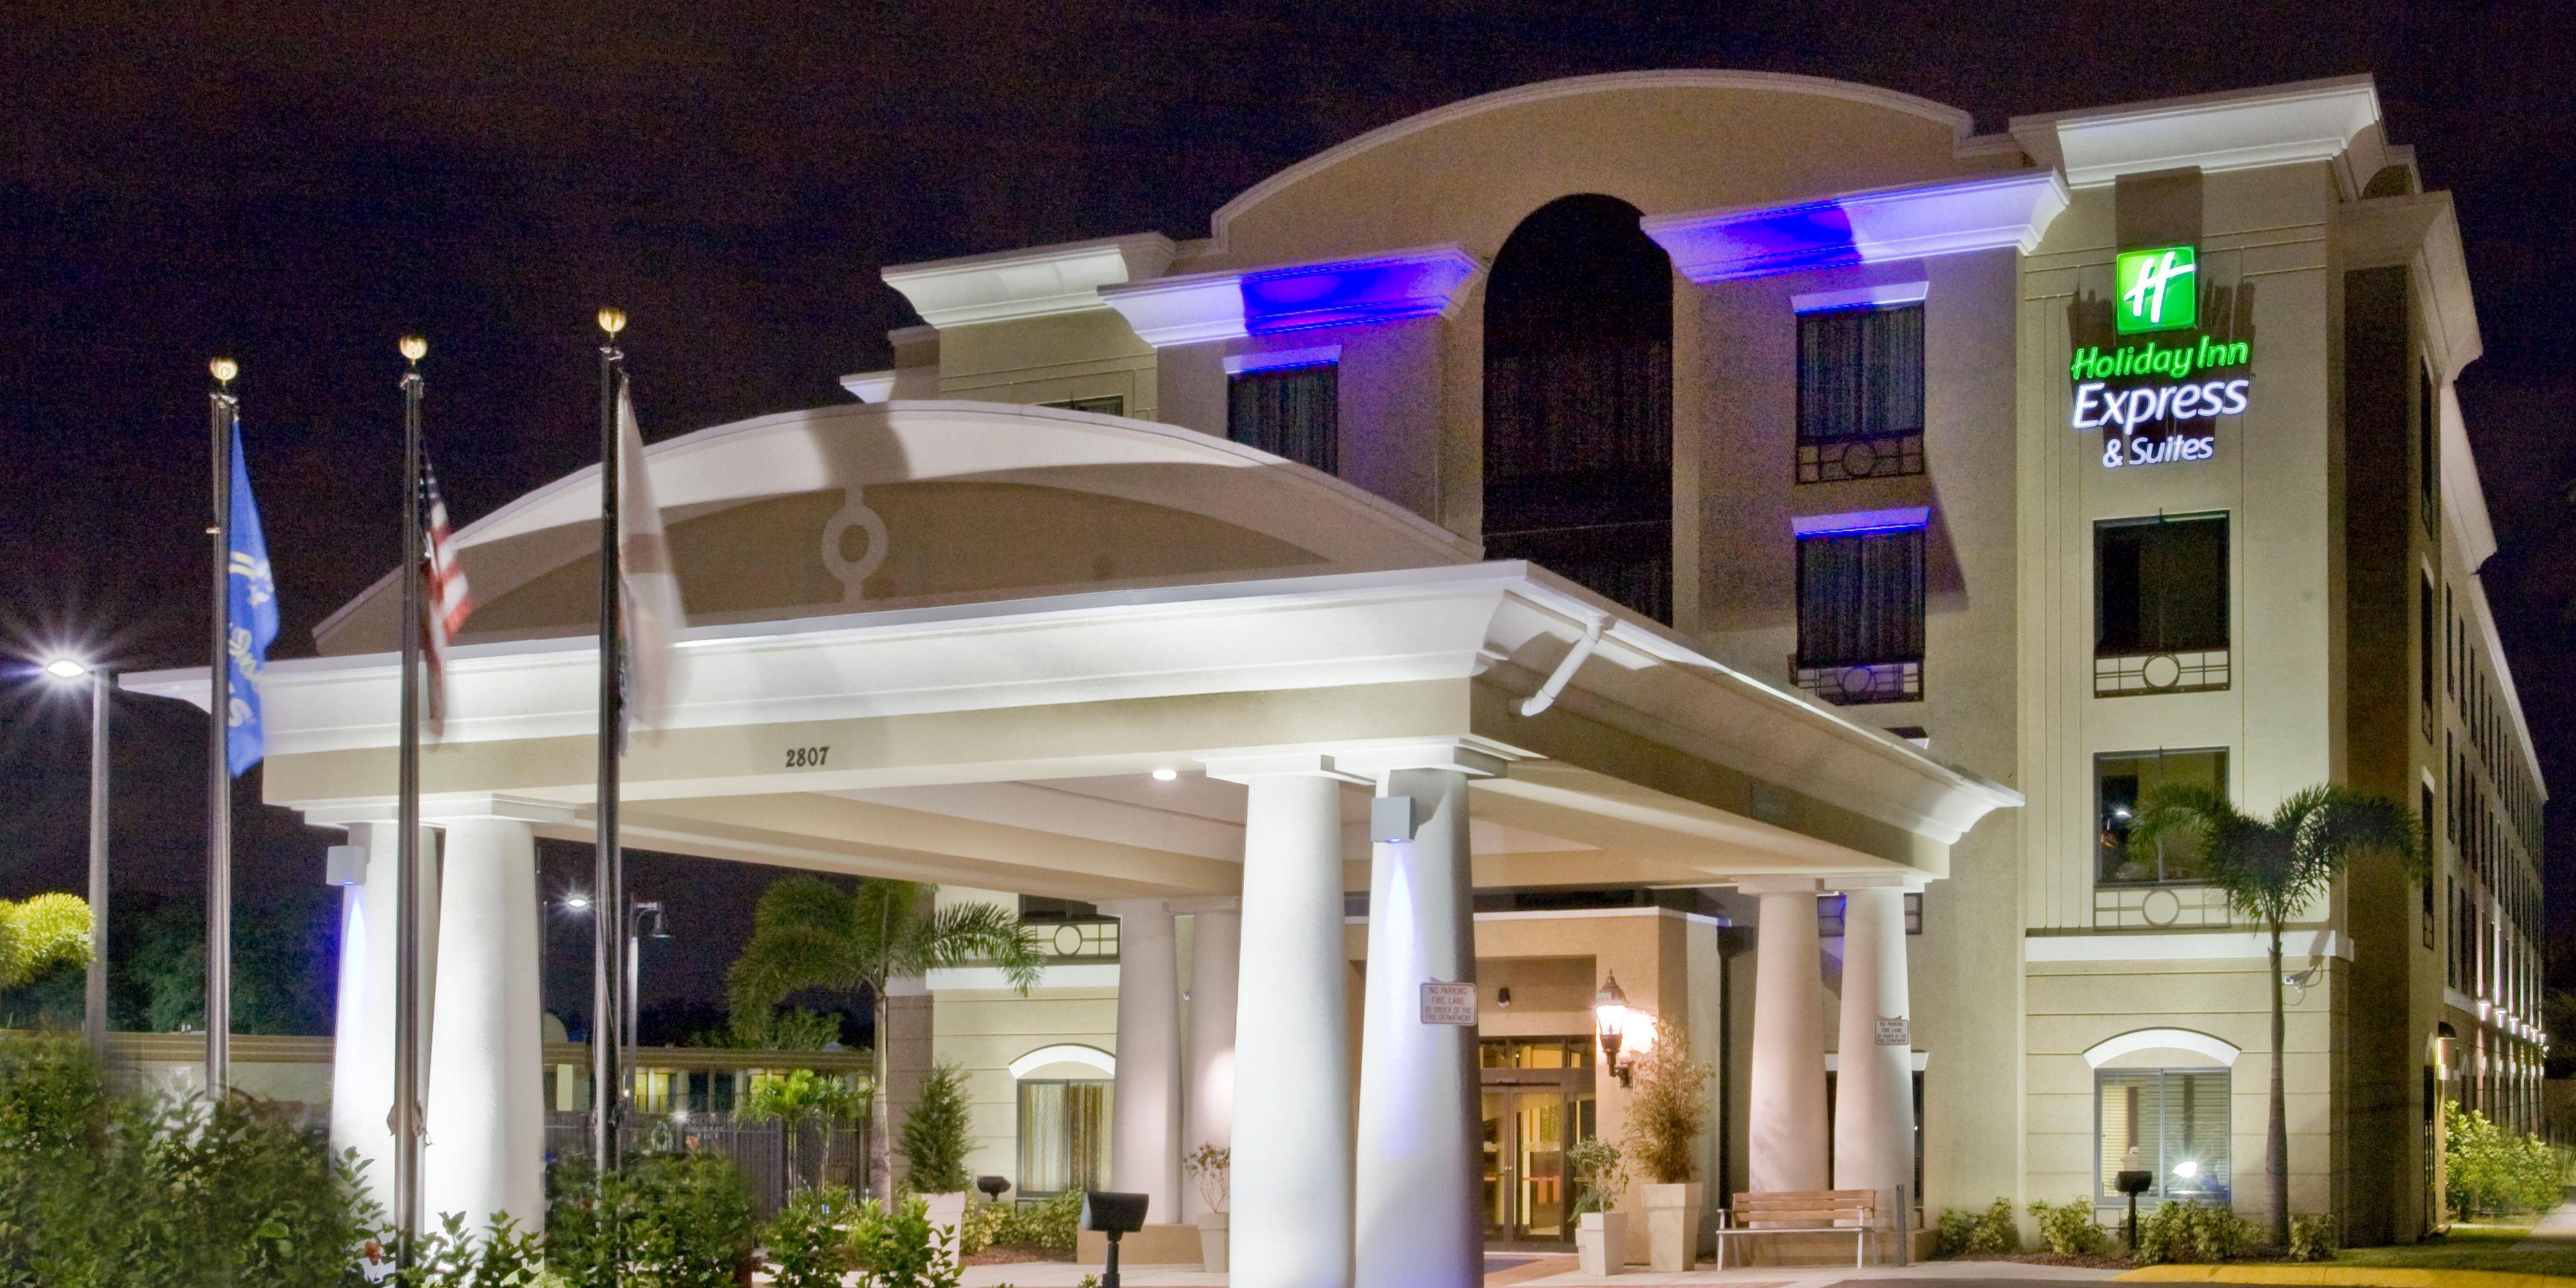 Hotels With Shuttle To Busch Gardens Tampa Fl Garden Ftempo